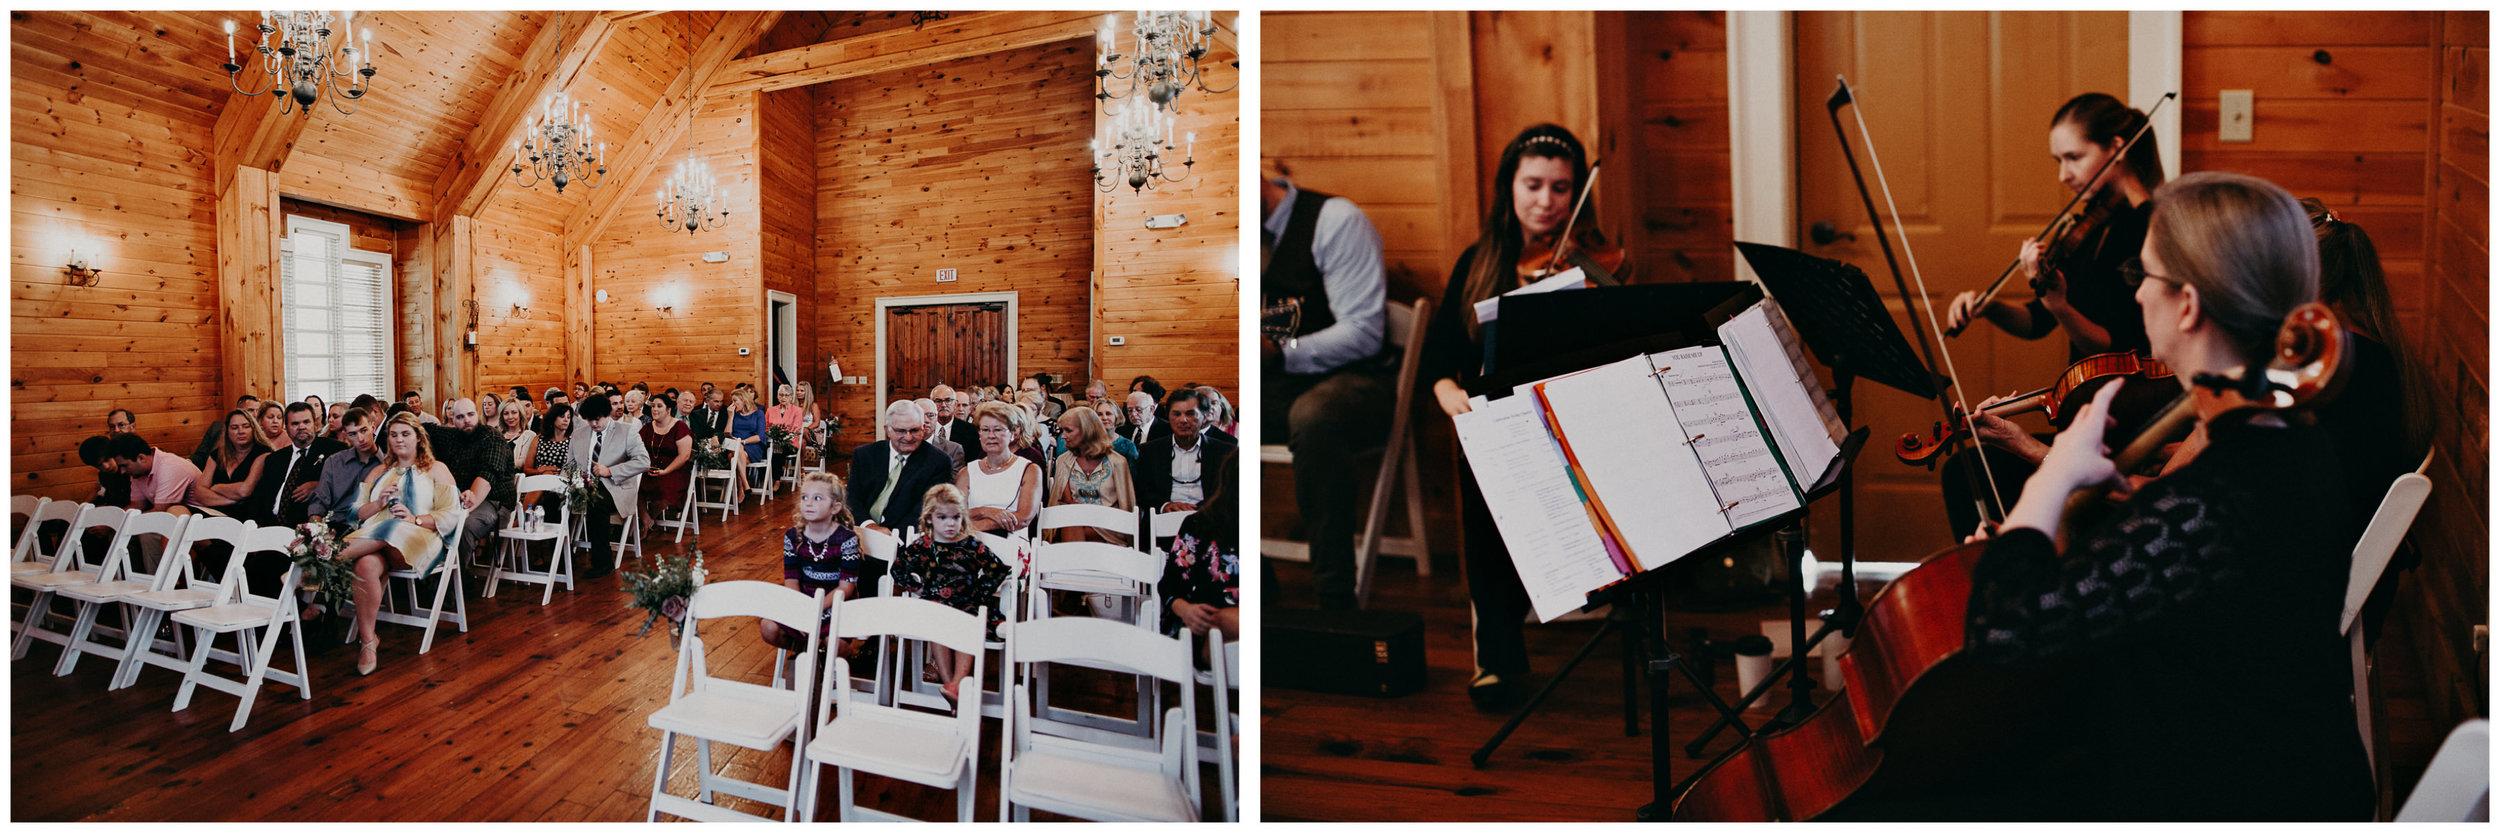 63 - Barnsley Gardens Wedding Ceremony Chapel - Atlanta wedding photographer .jpg